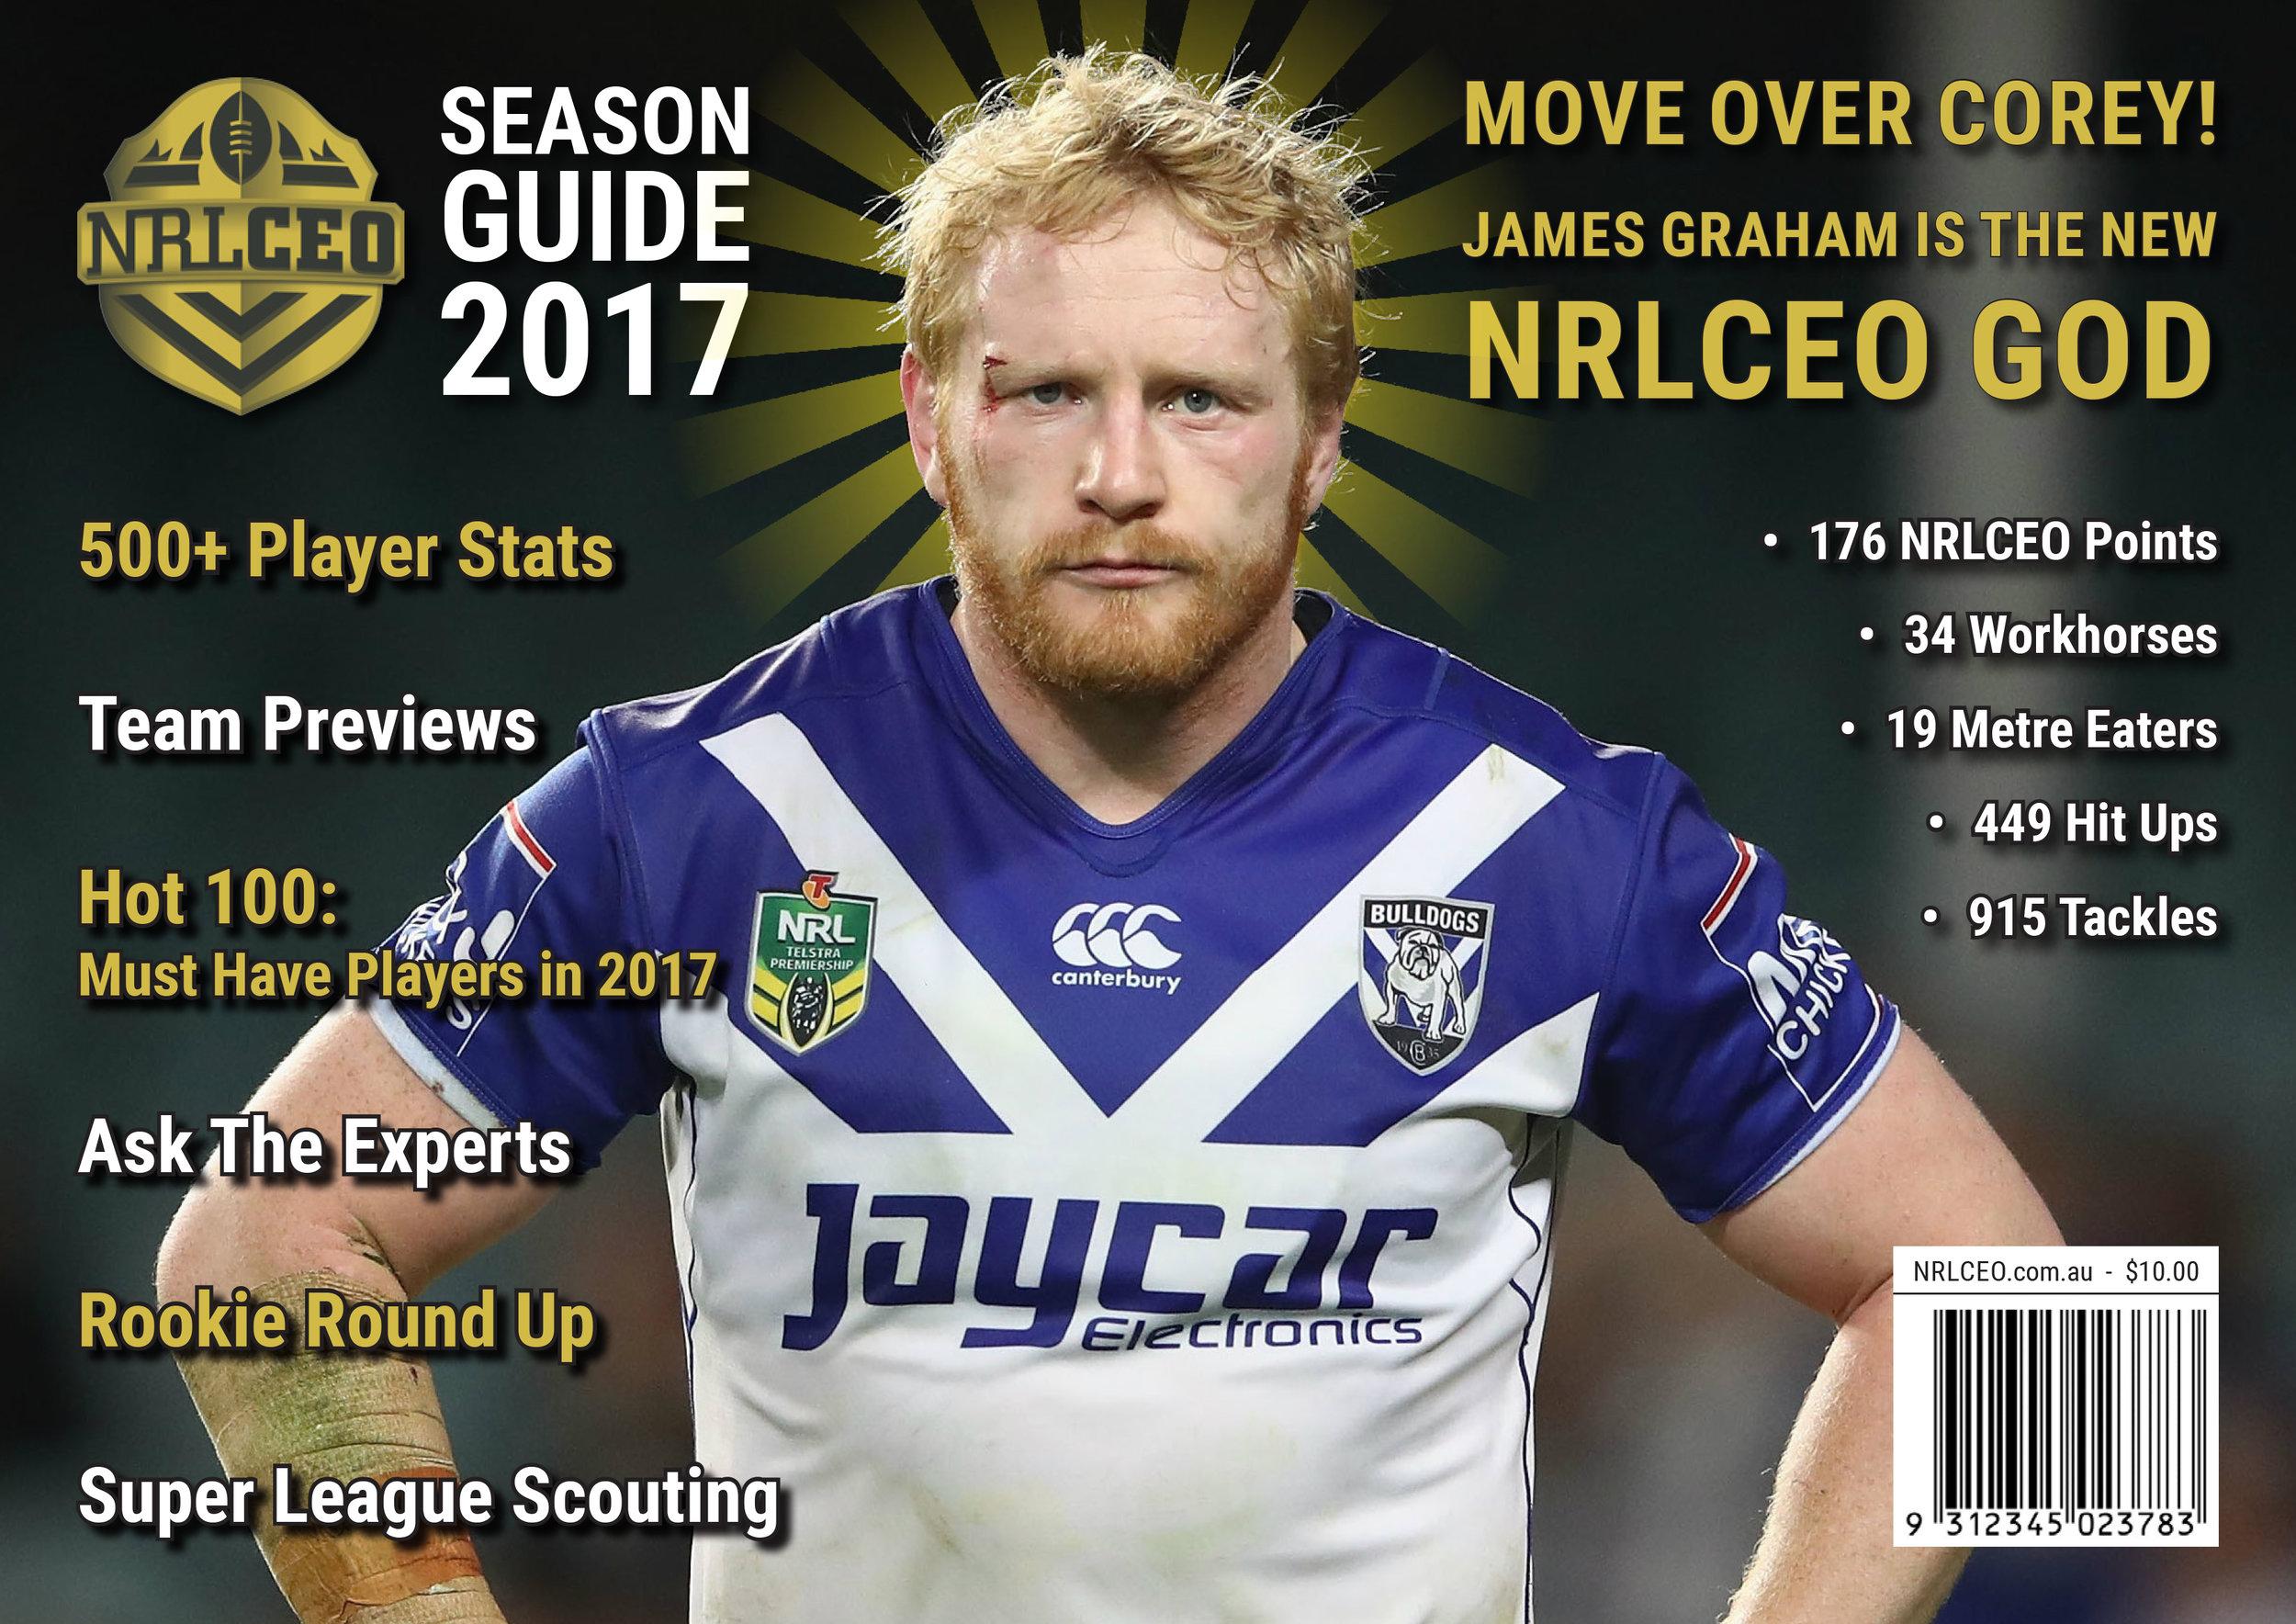 NRLCEO 2017 Season Guide-1.jpg